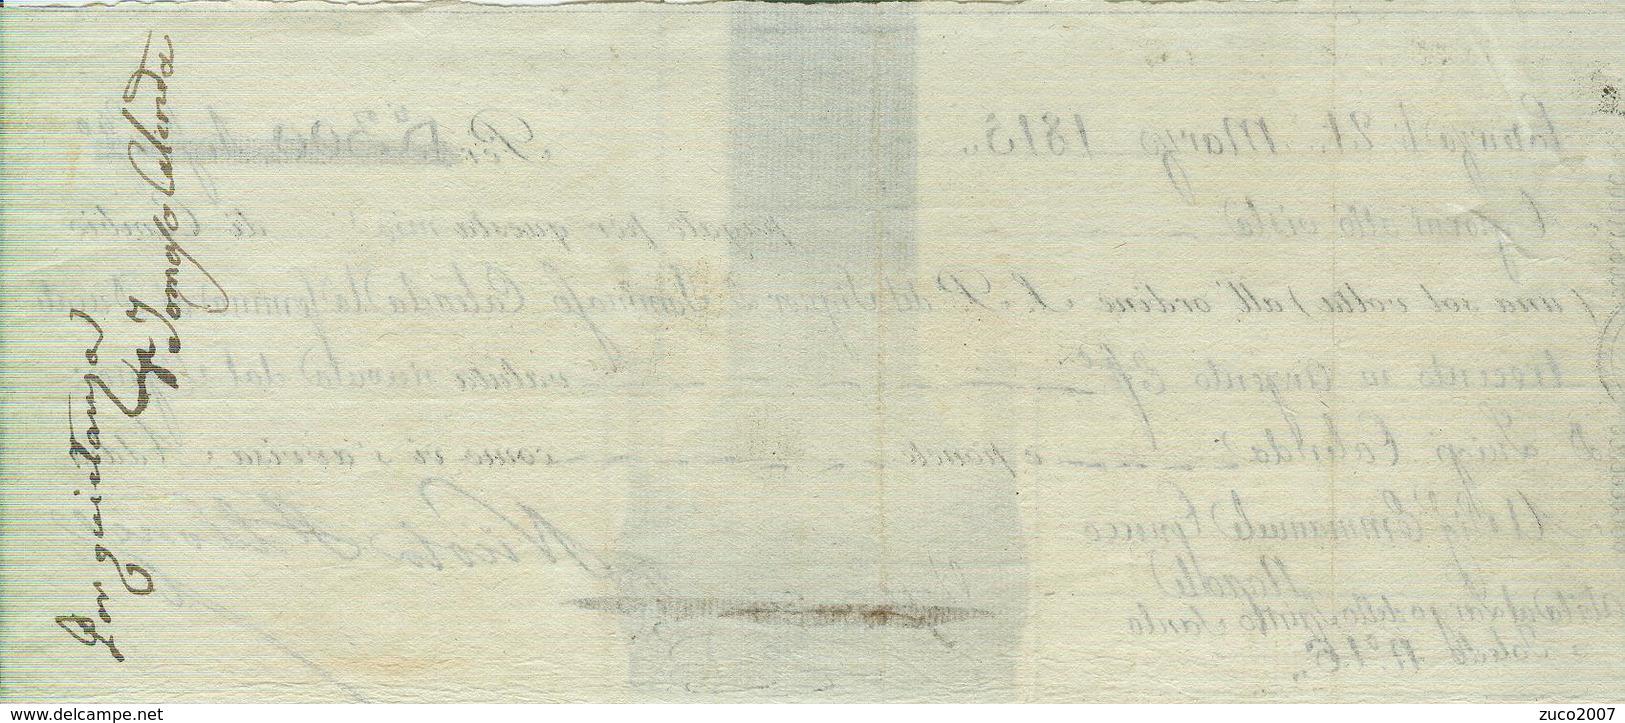 CAMBIALE  EMESSA A POTENZA 21 MARZO 1815, PER DUCATI 300 IN ARGENTO,SCADENZA  A VISTA, - Bills Of Exchange